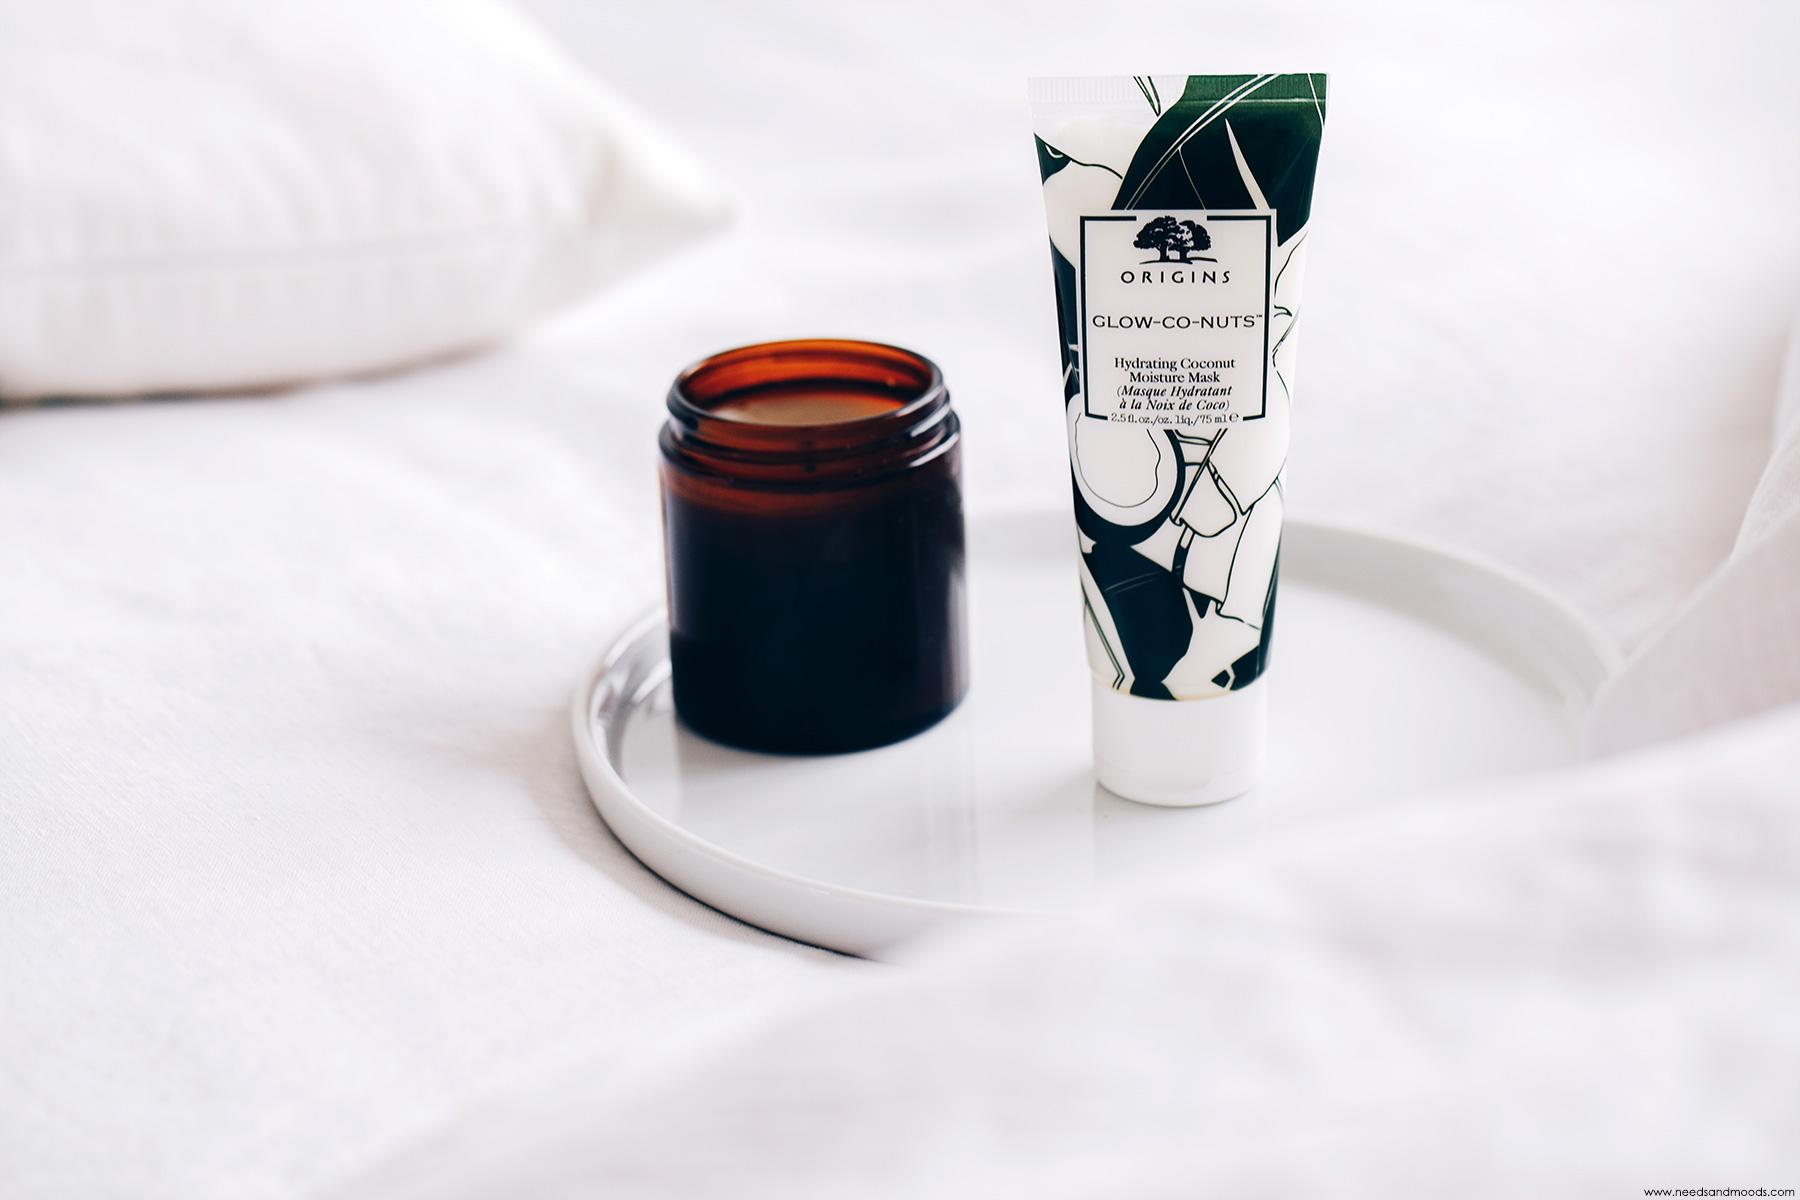 origins masque hydratant noix de coco avis